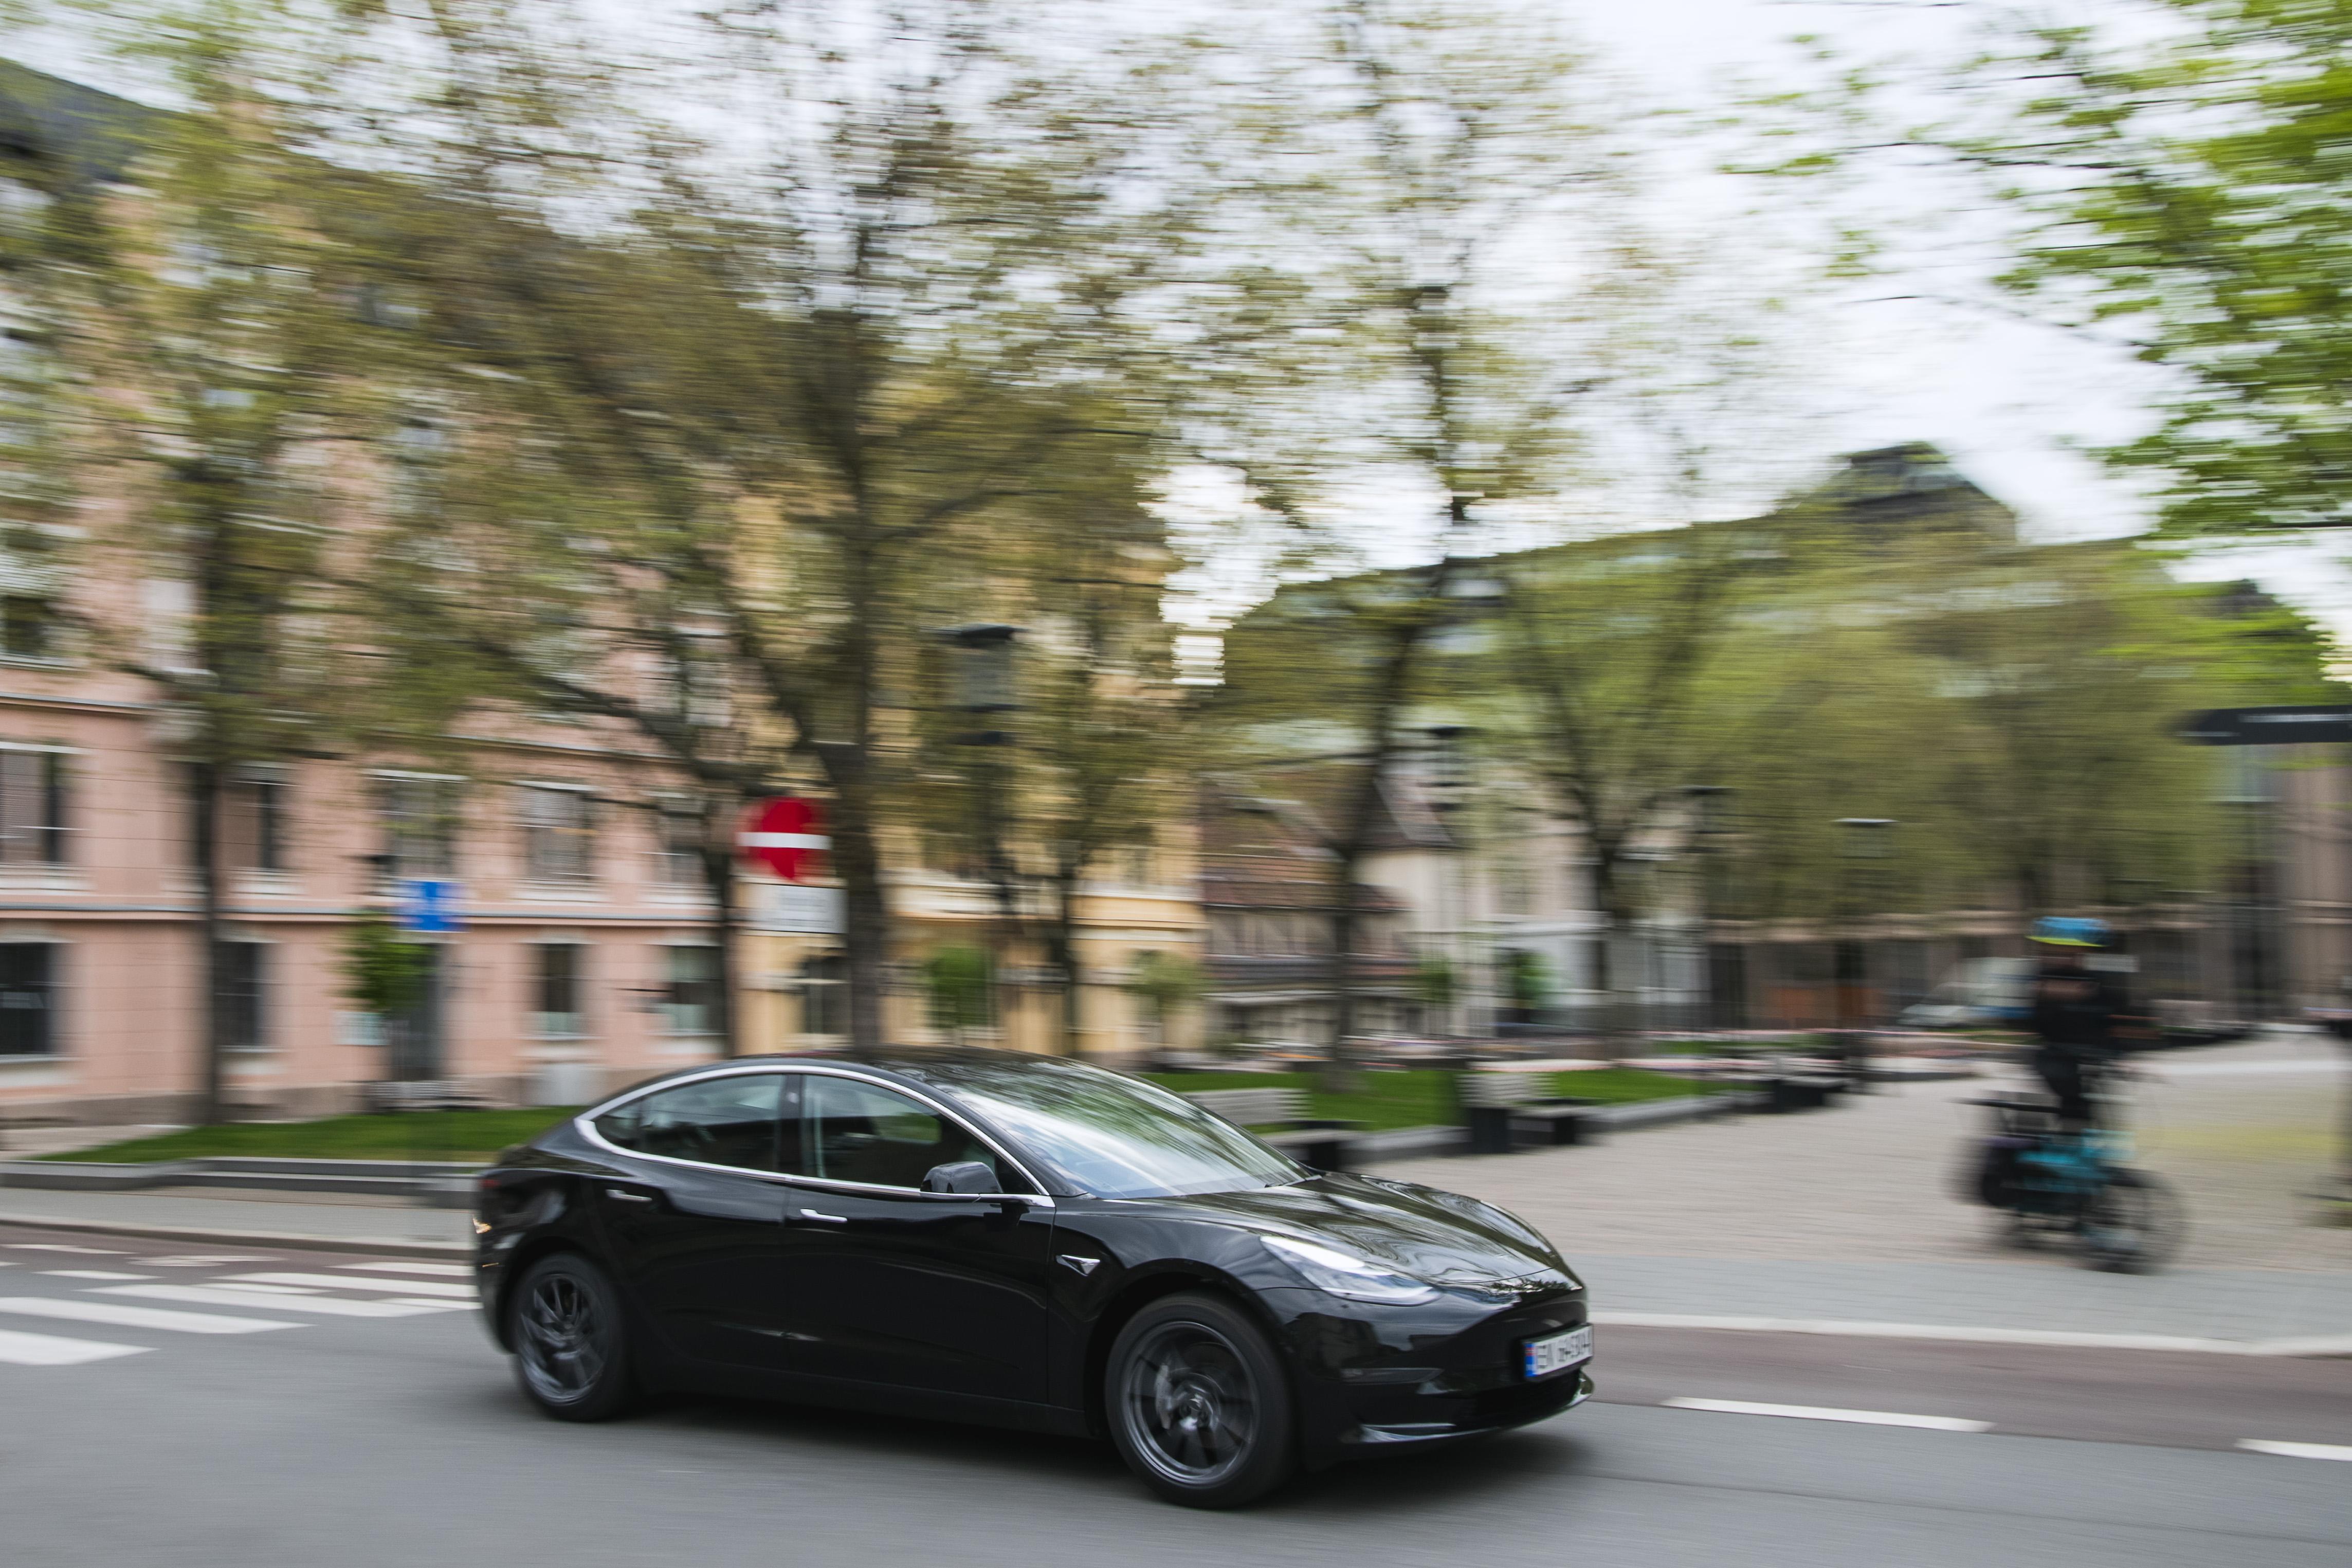 A Tesla automobile speeding down a street.